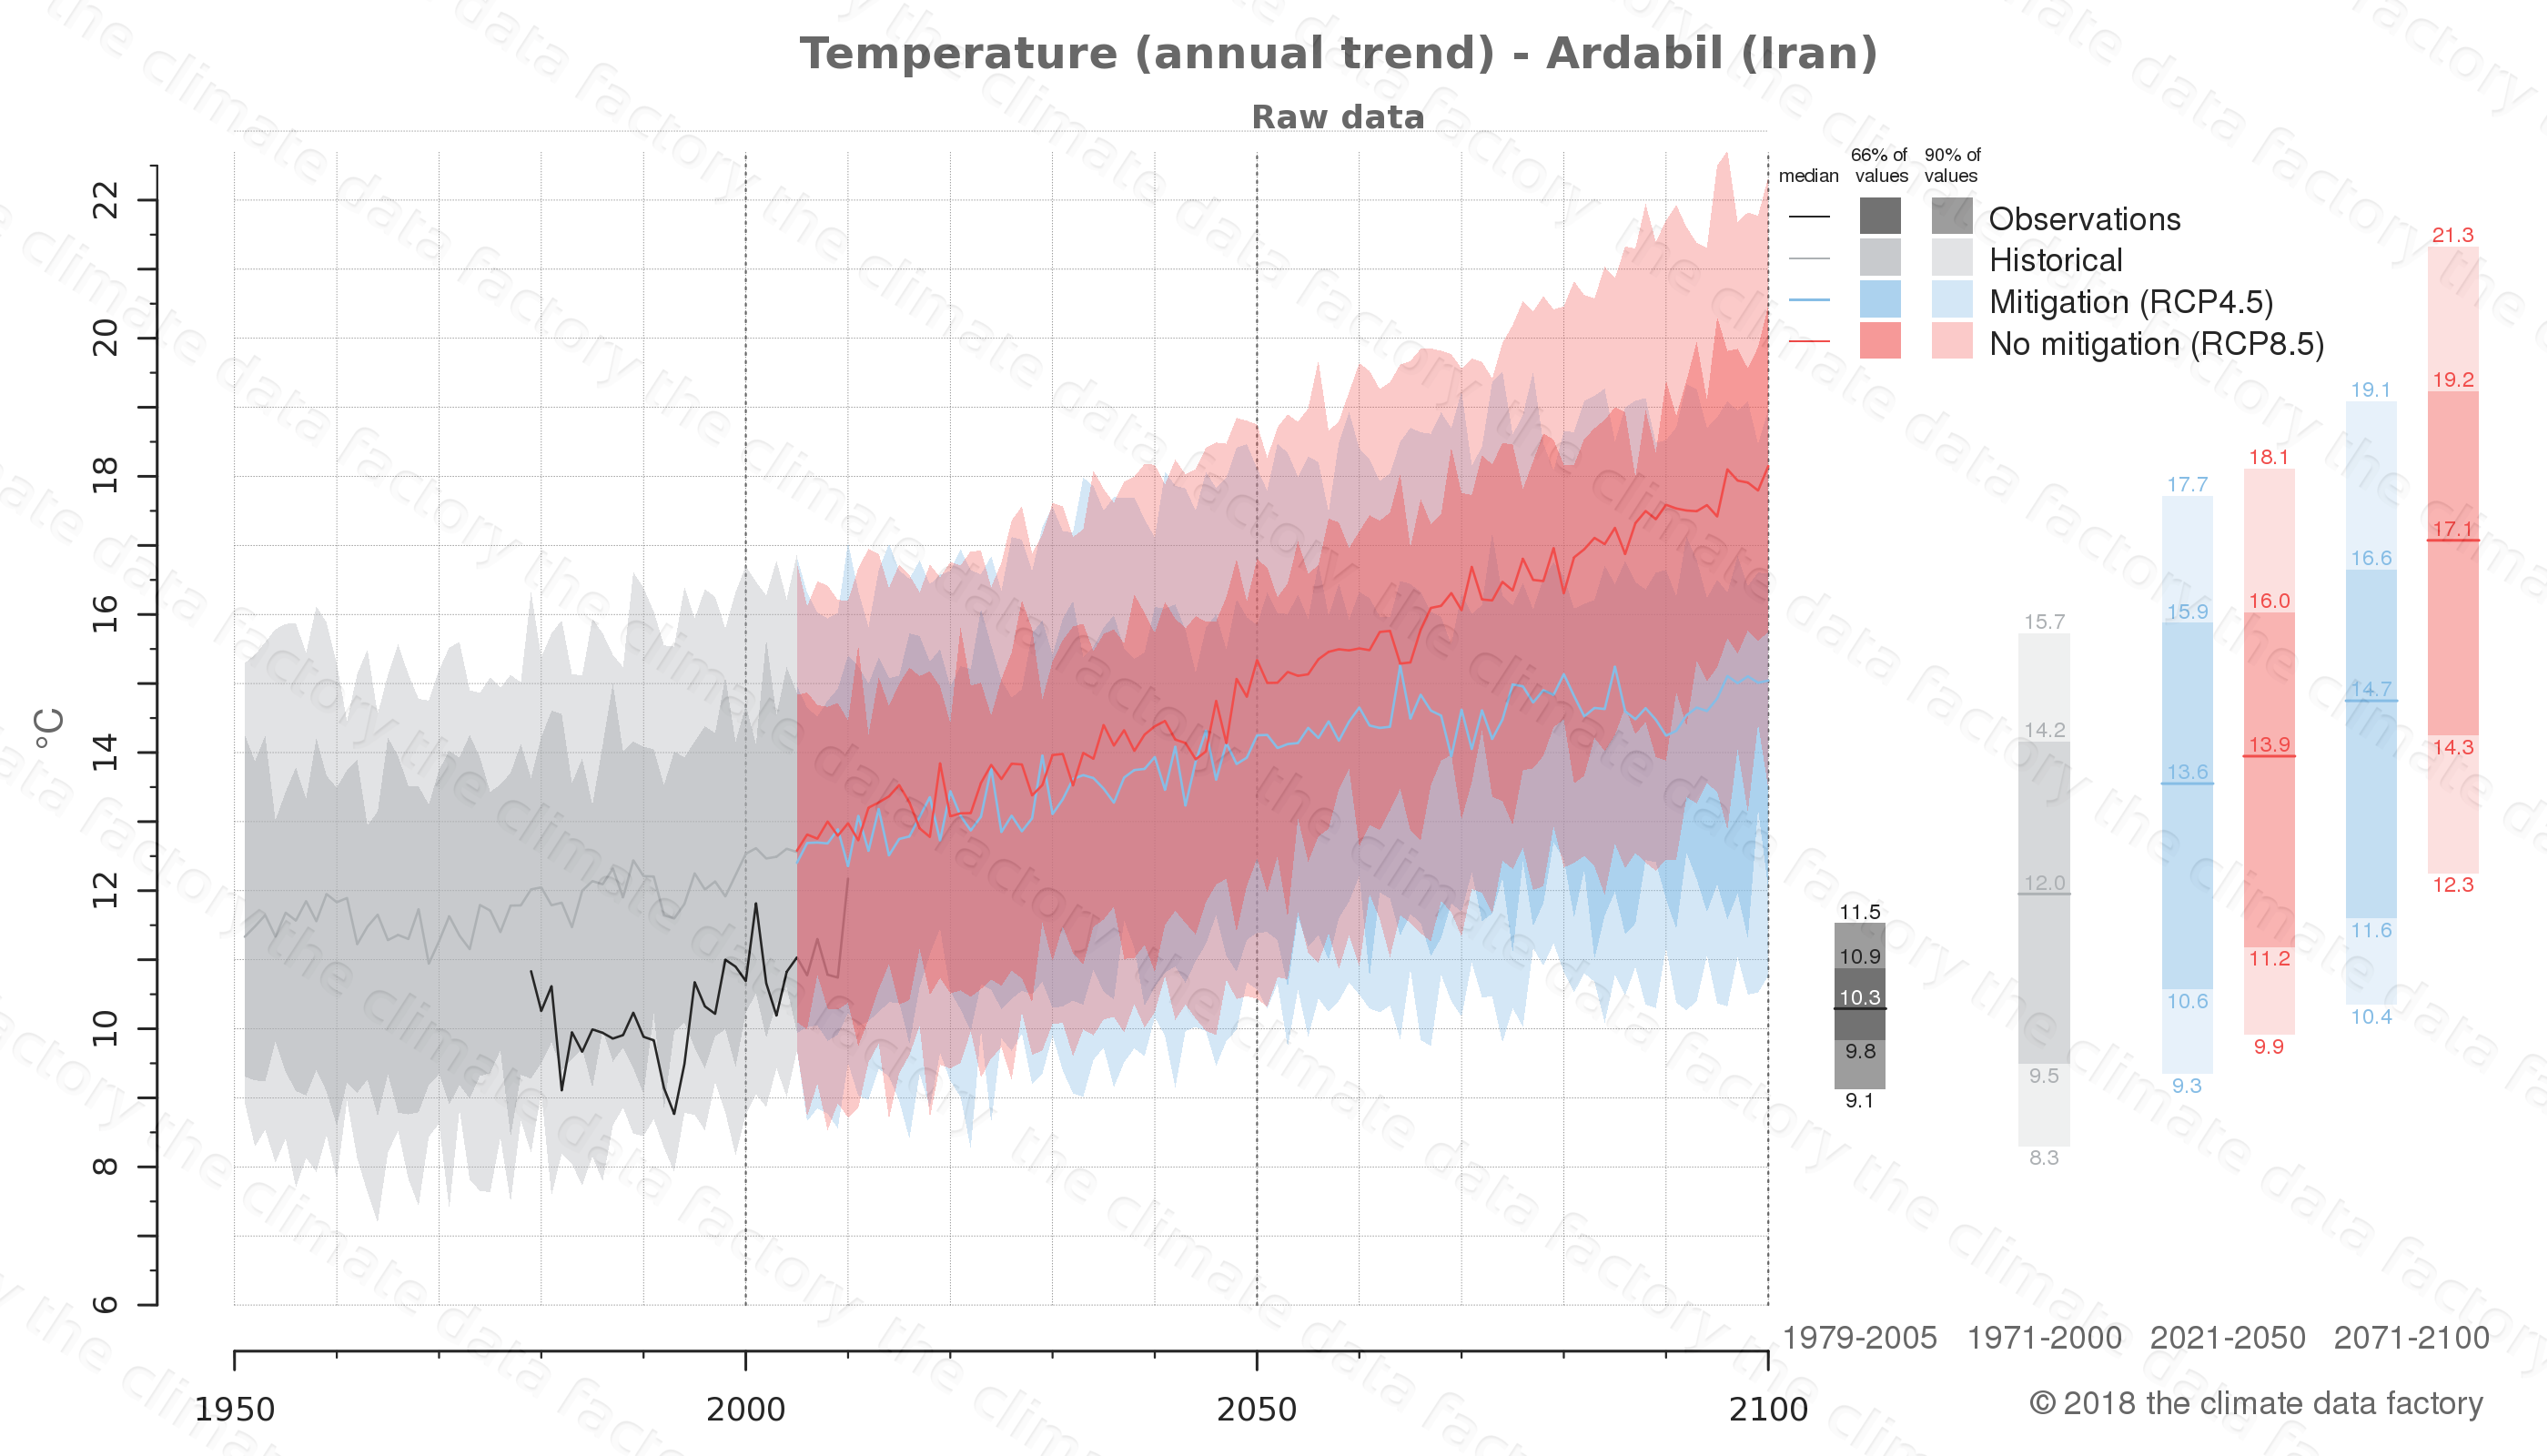 climate change data policy adaptation climate graph city data temperature ardabil iran